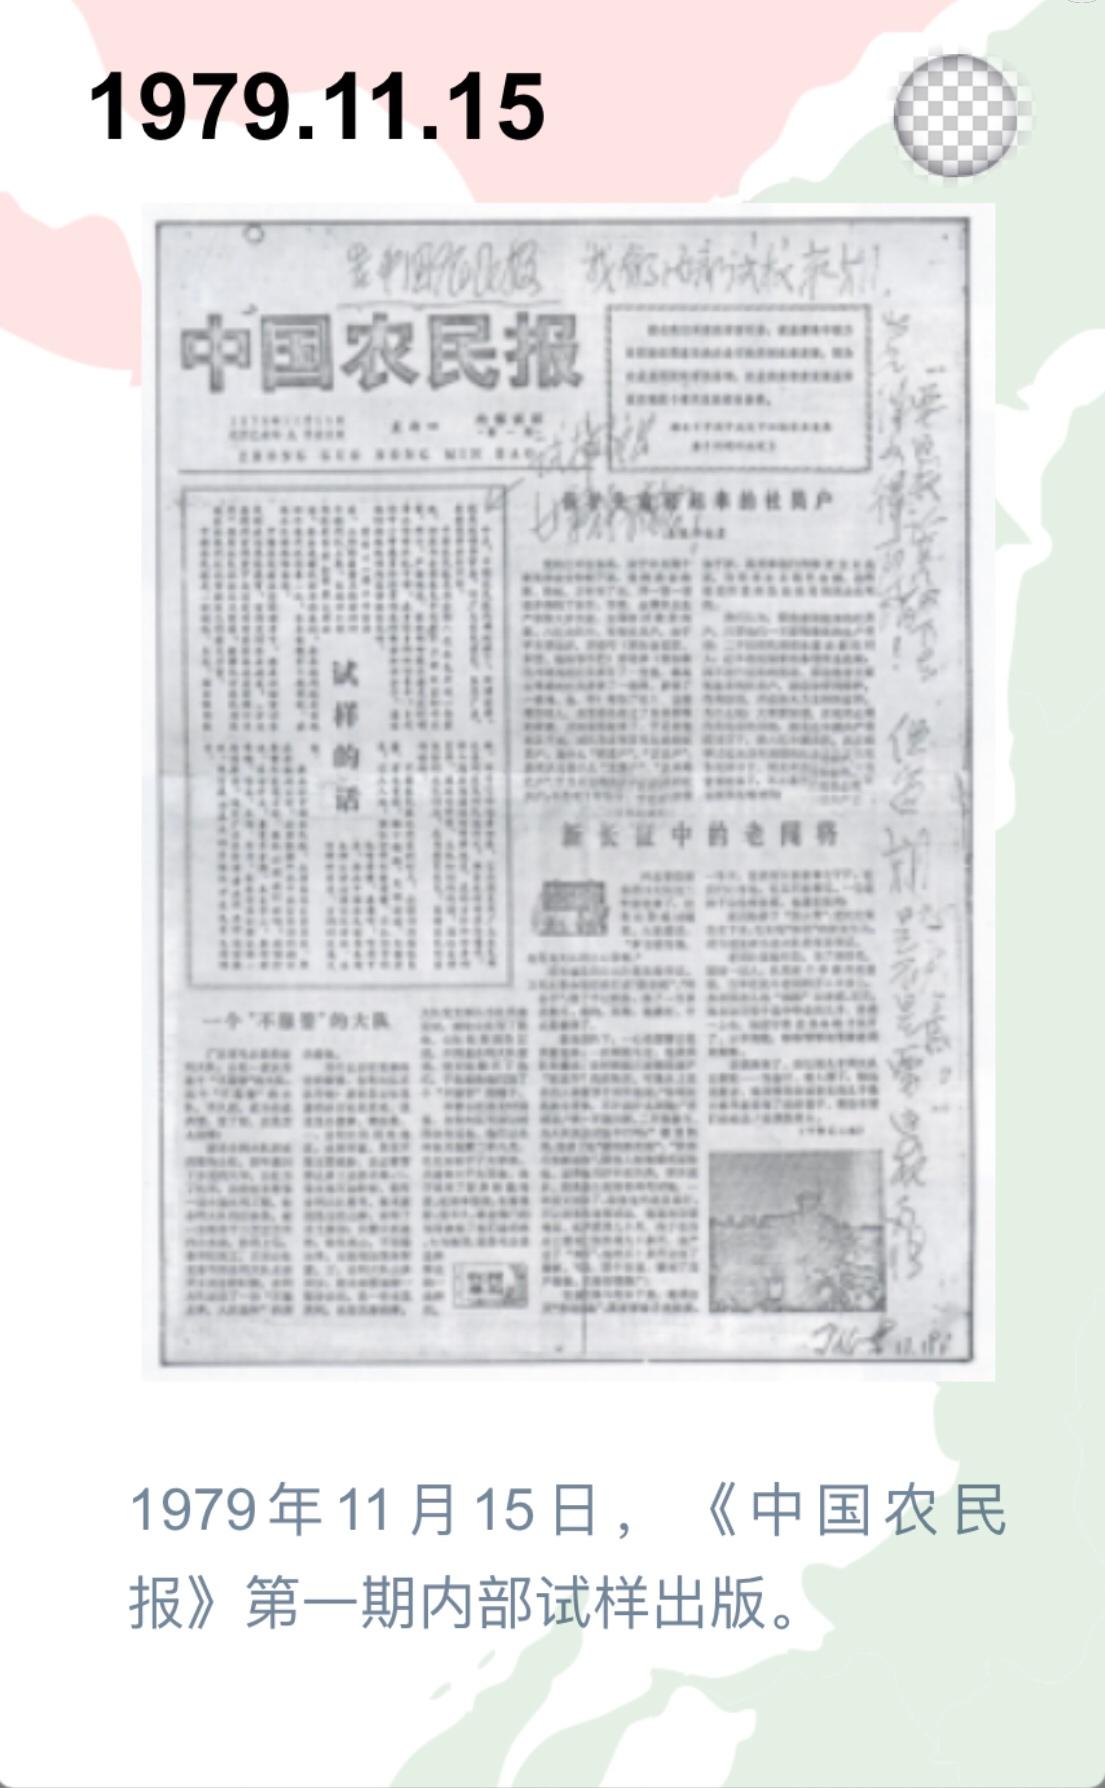 1979.11.15